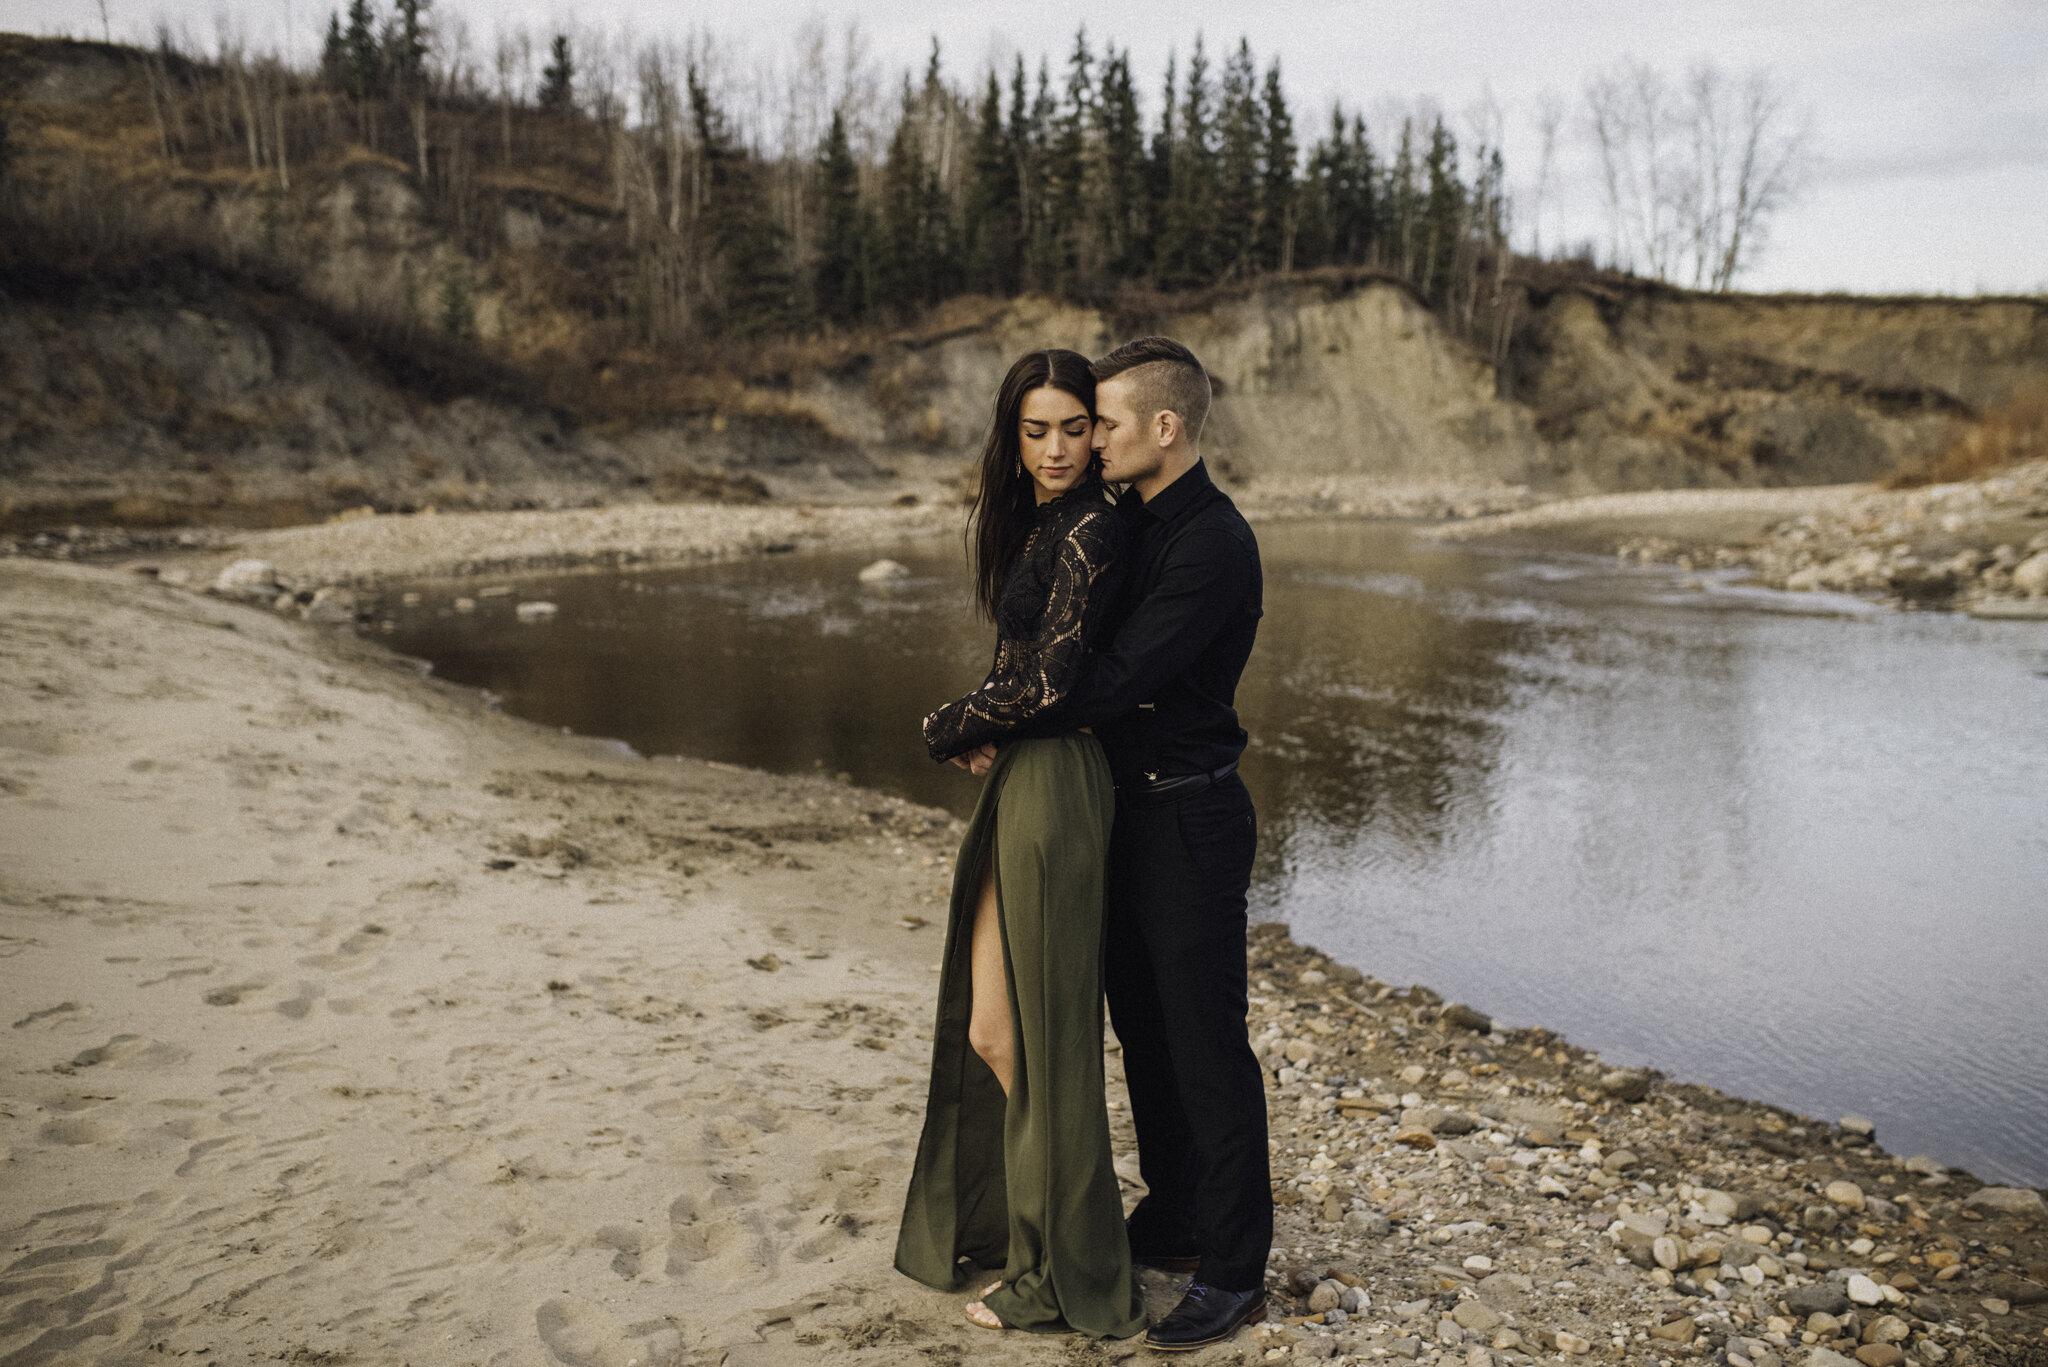 SabrinaMayPhotography-Couples-dawsoncreek-4.jpg